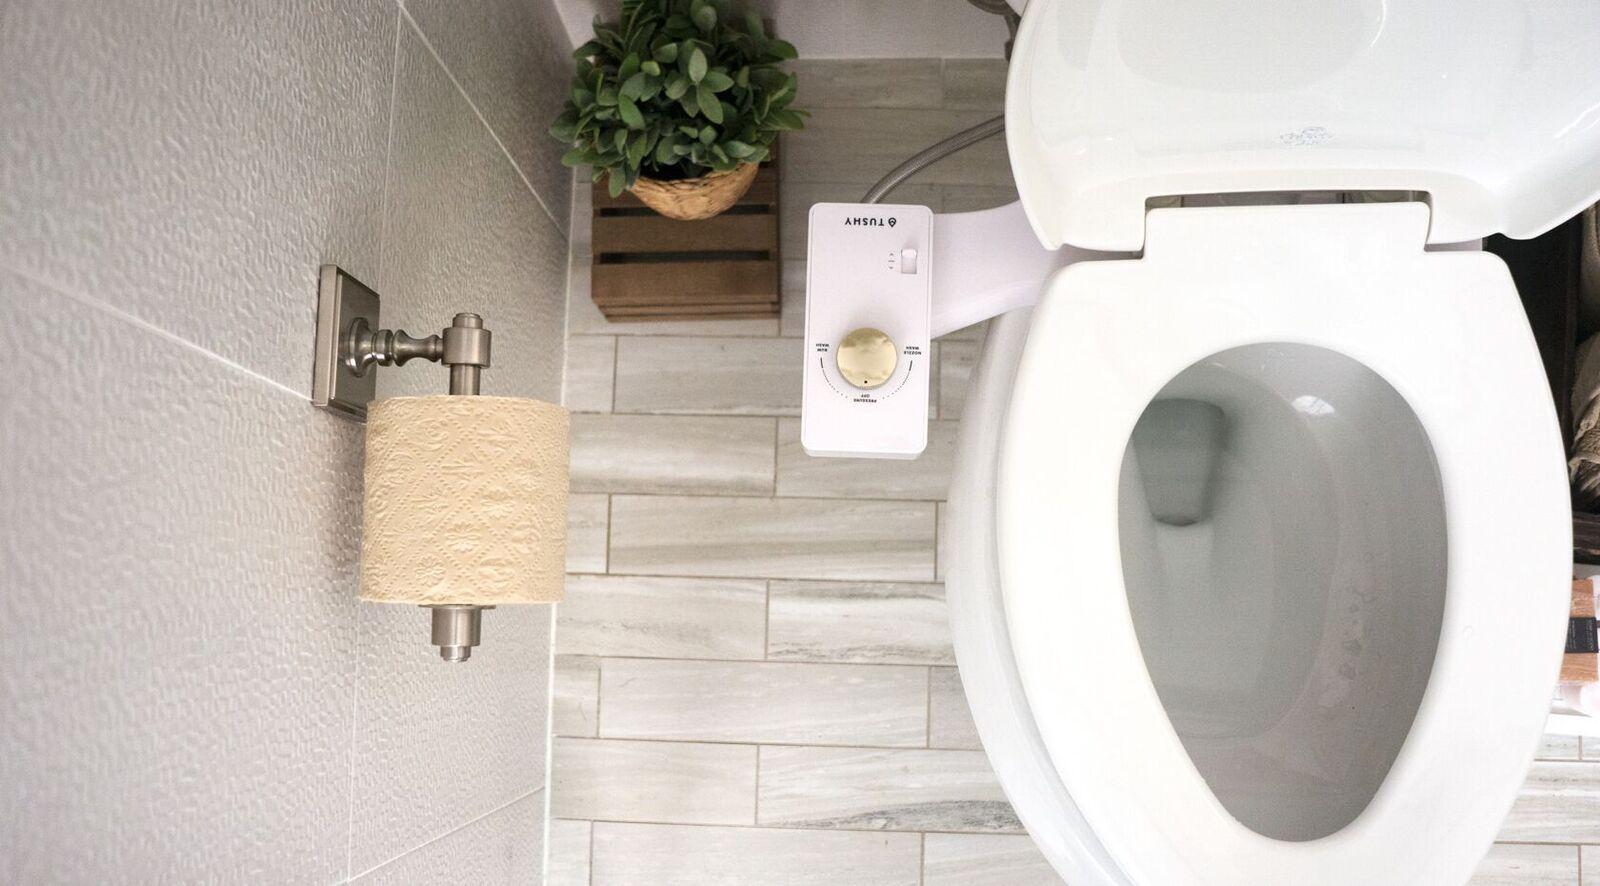 Fantastic Under 100 Toilet Seat Bidets Reviews Installation Info Ibusinesslaw Wood Chair Design Ideas Ibusinesslaworg